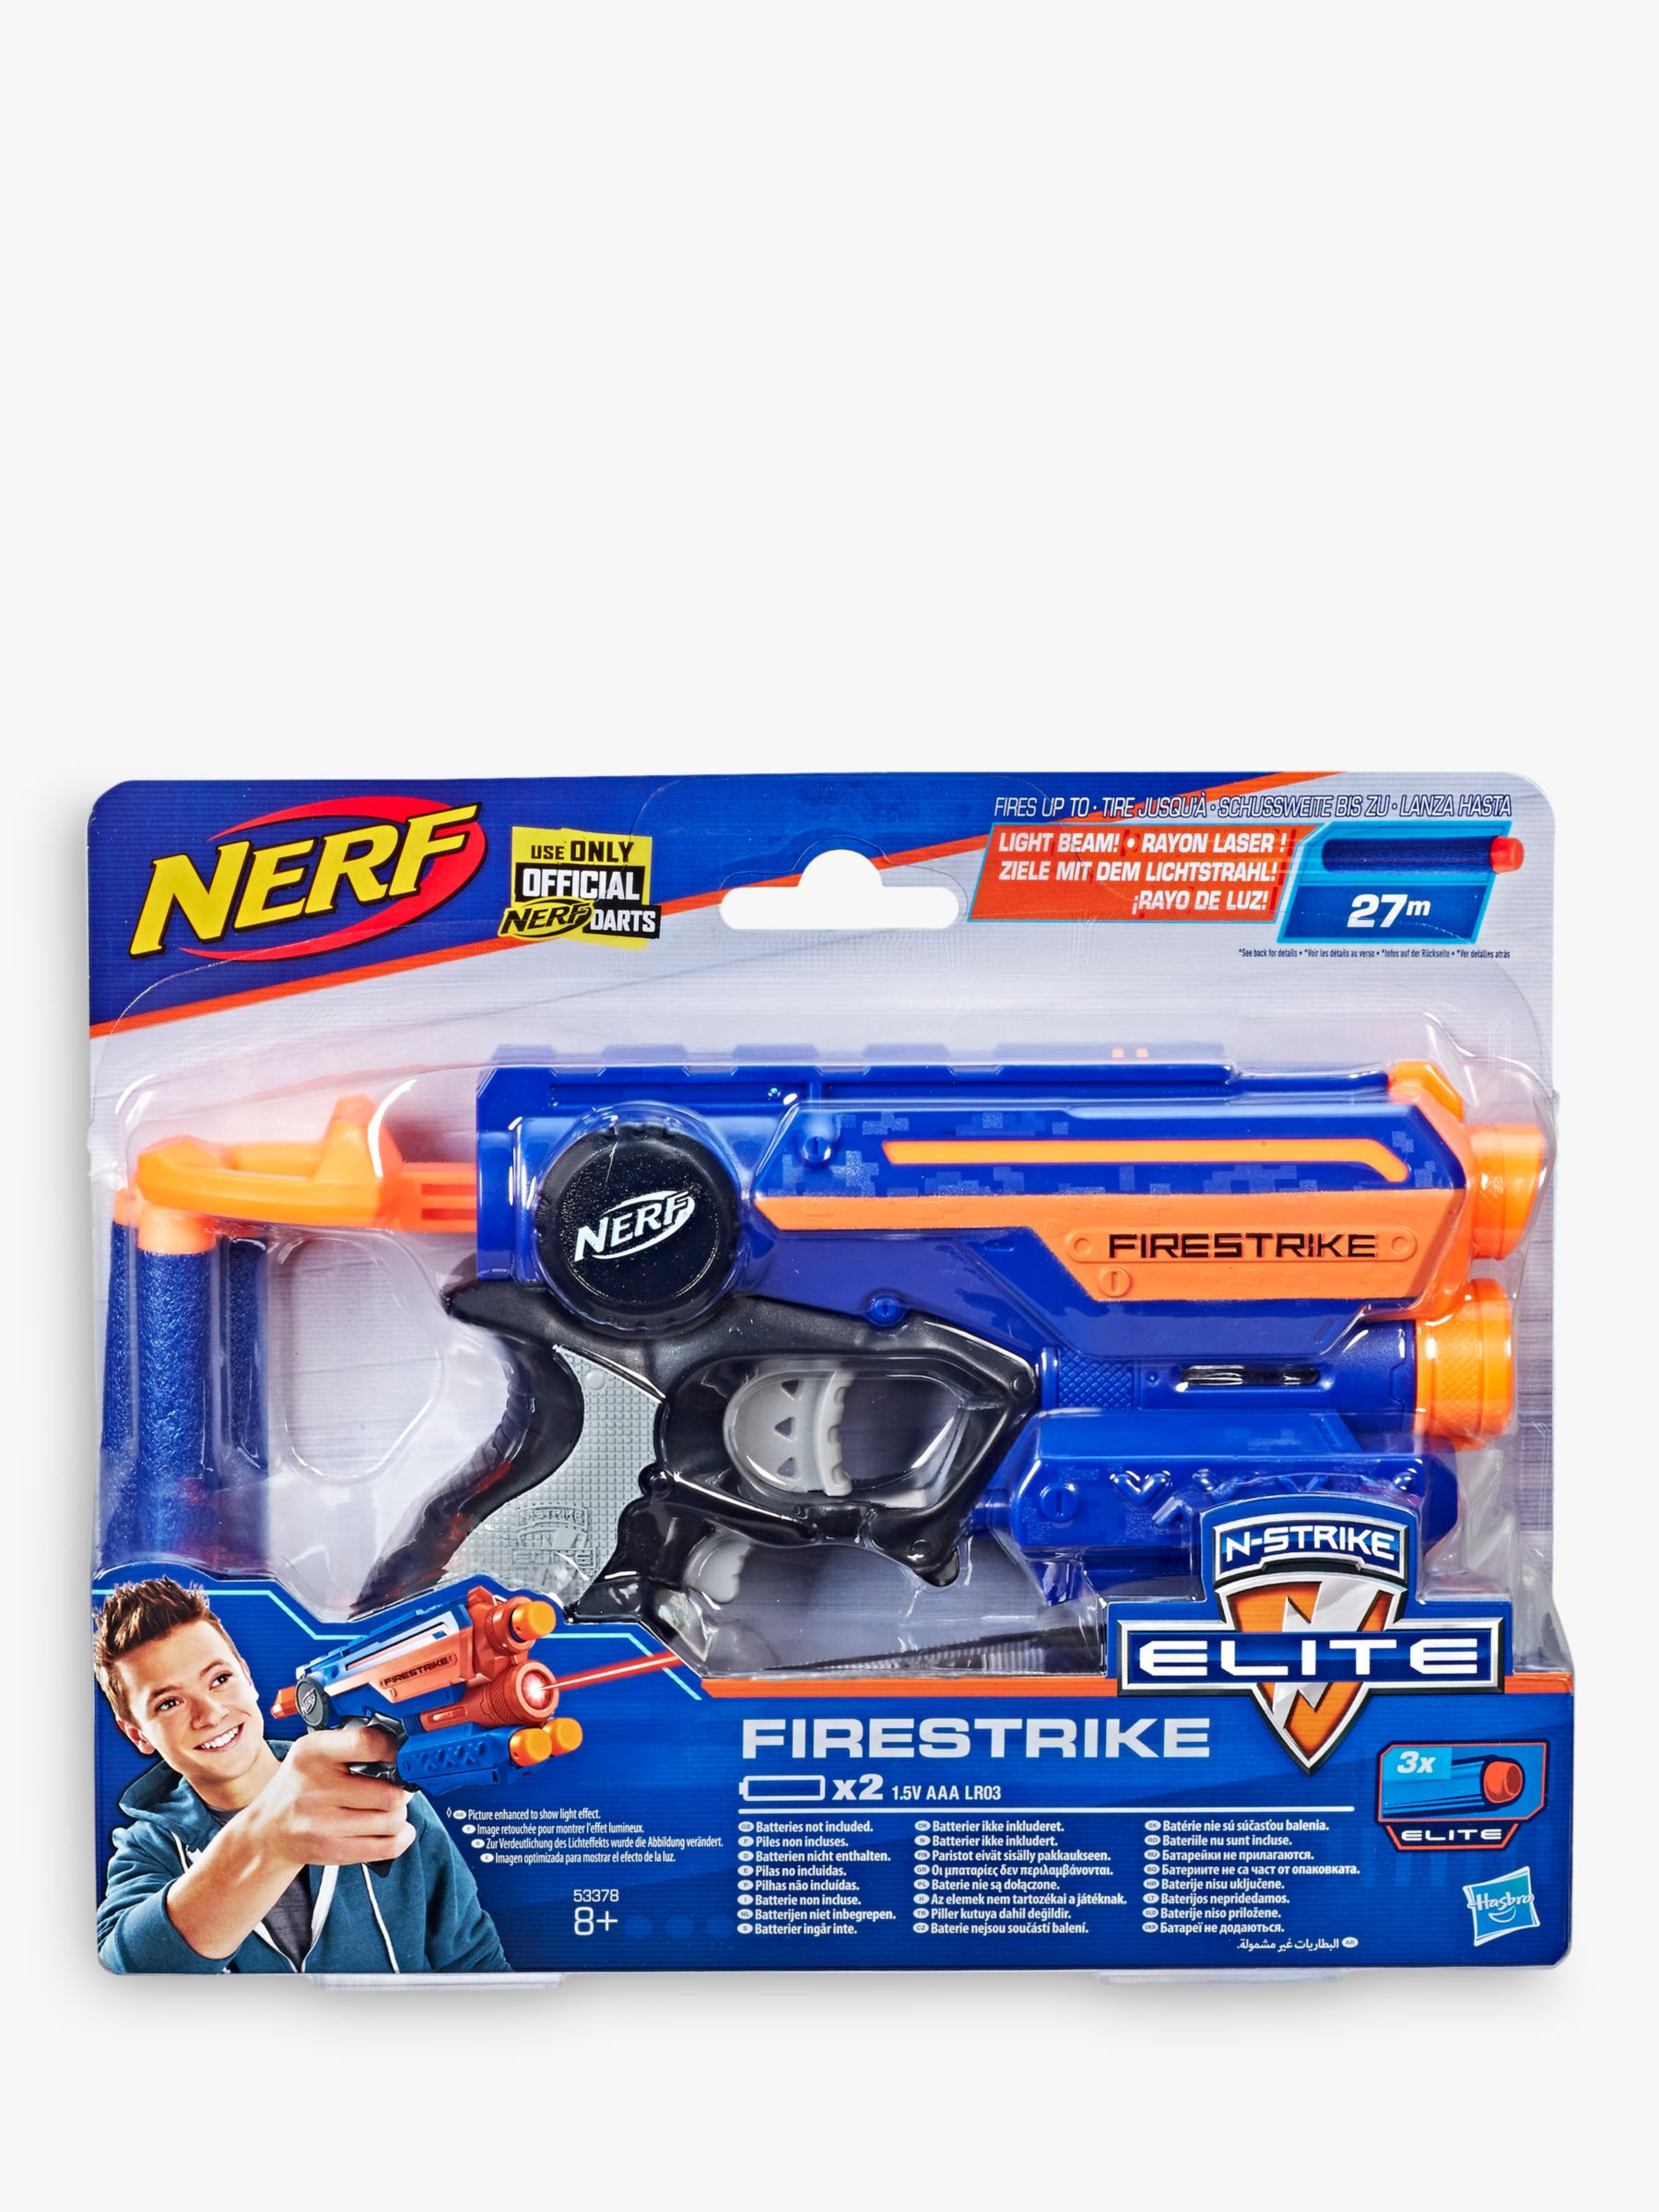 NERF Nerf N-Strike Elite Firestrike Blaster